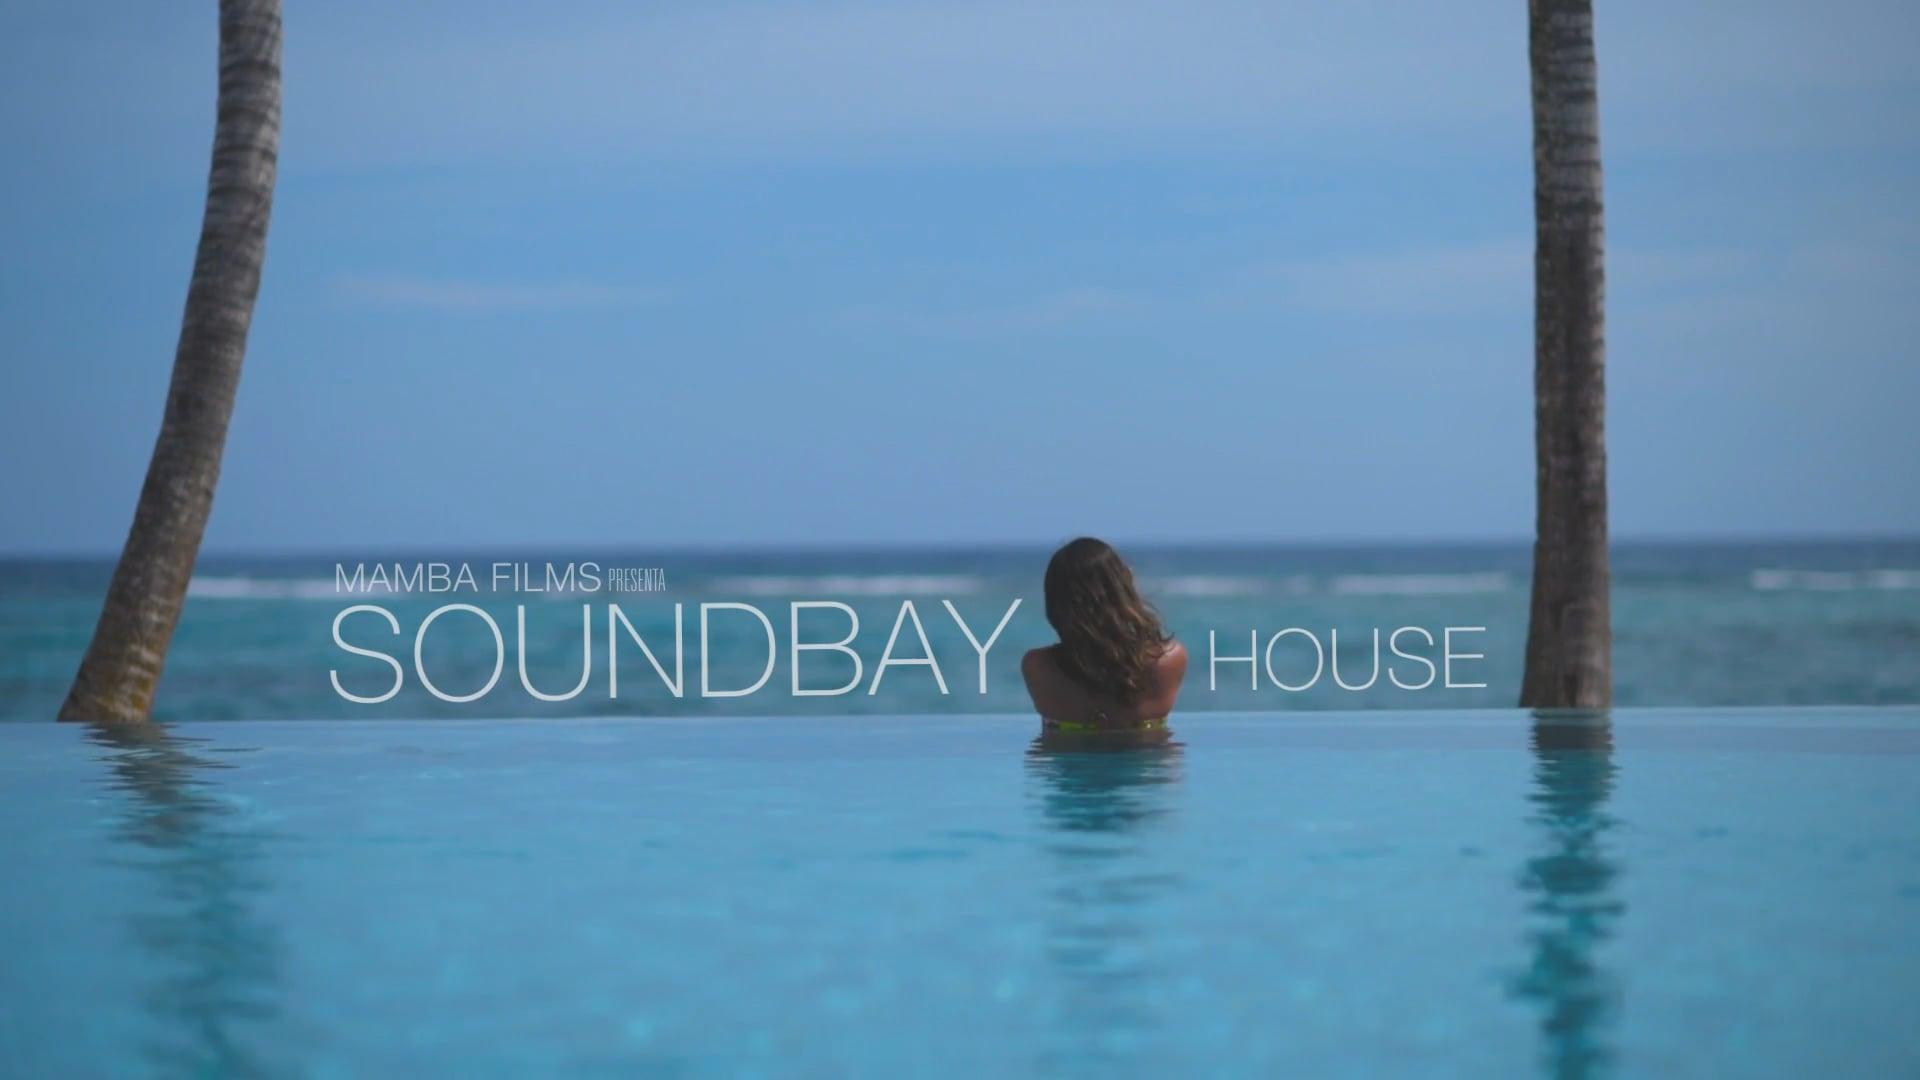 Sound Bay House